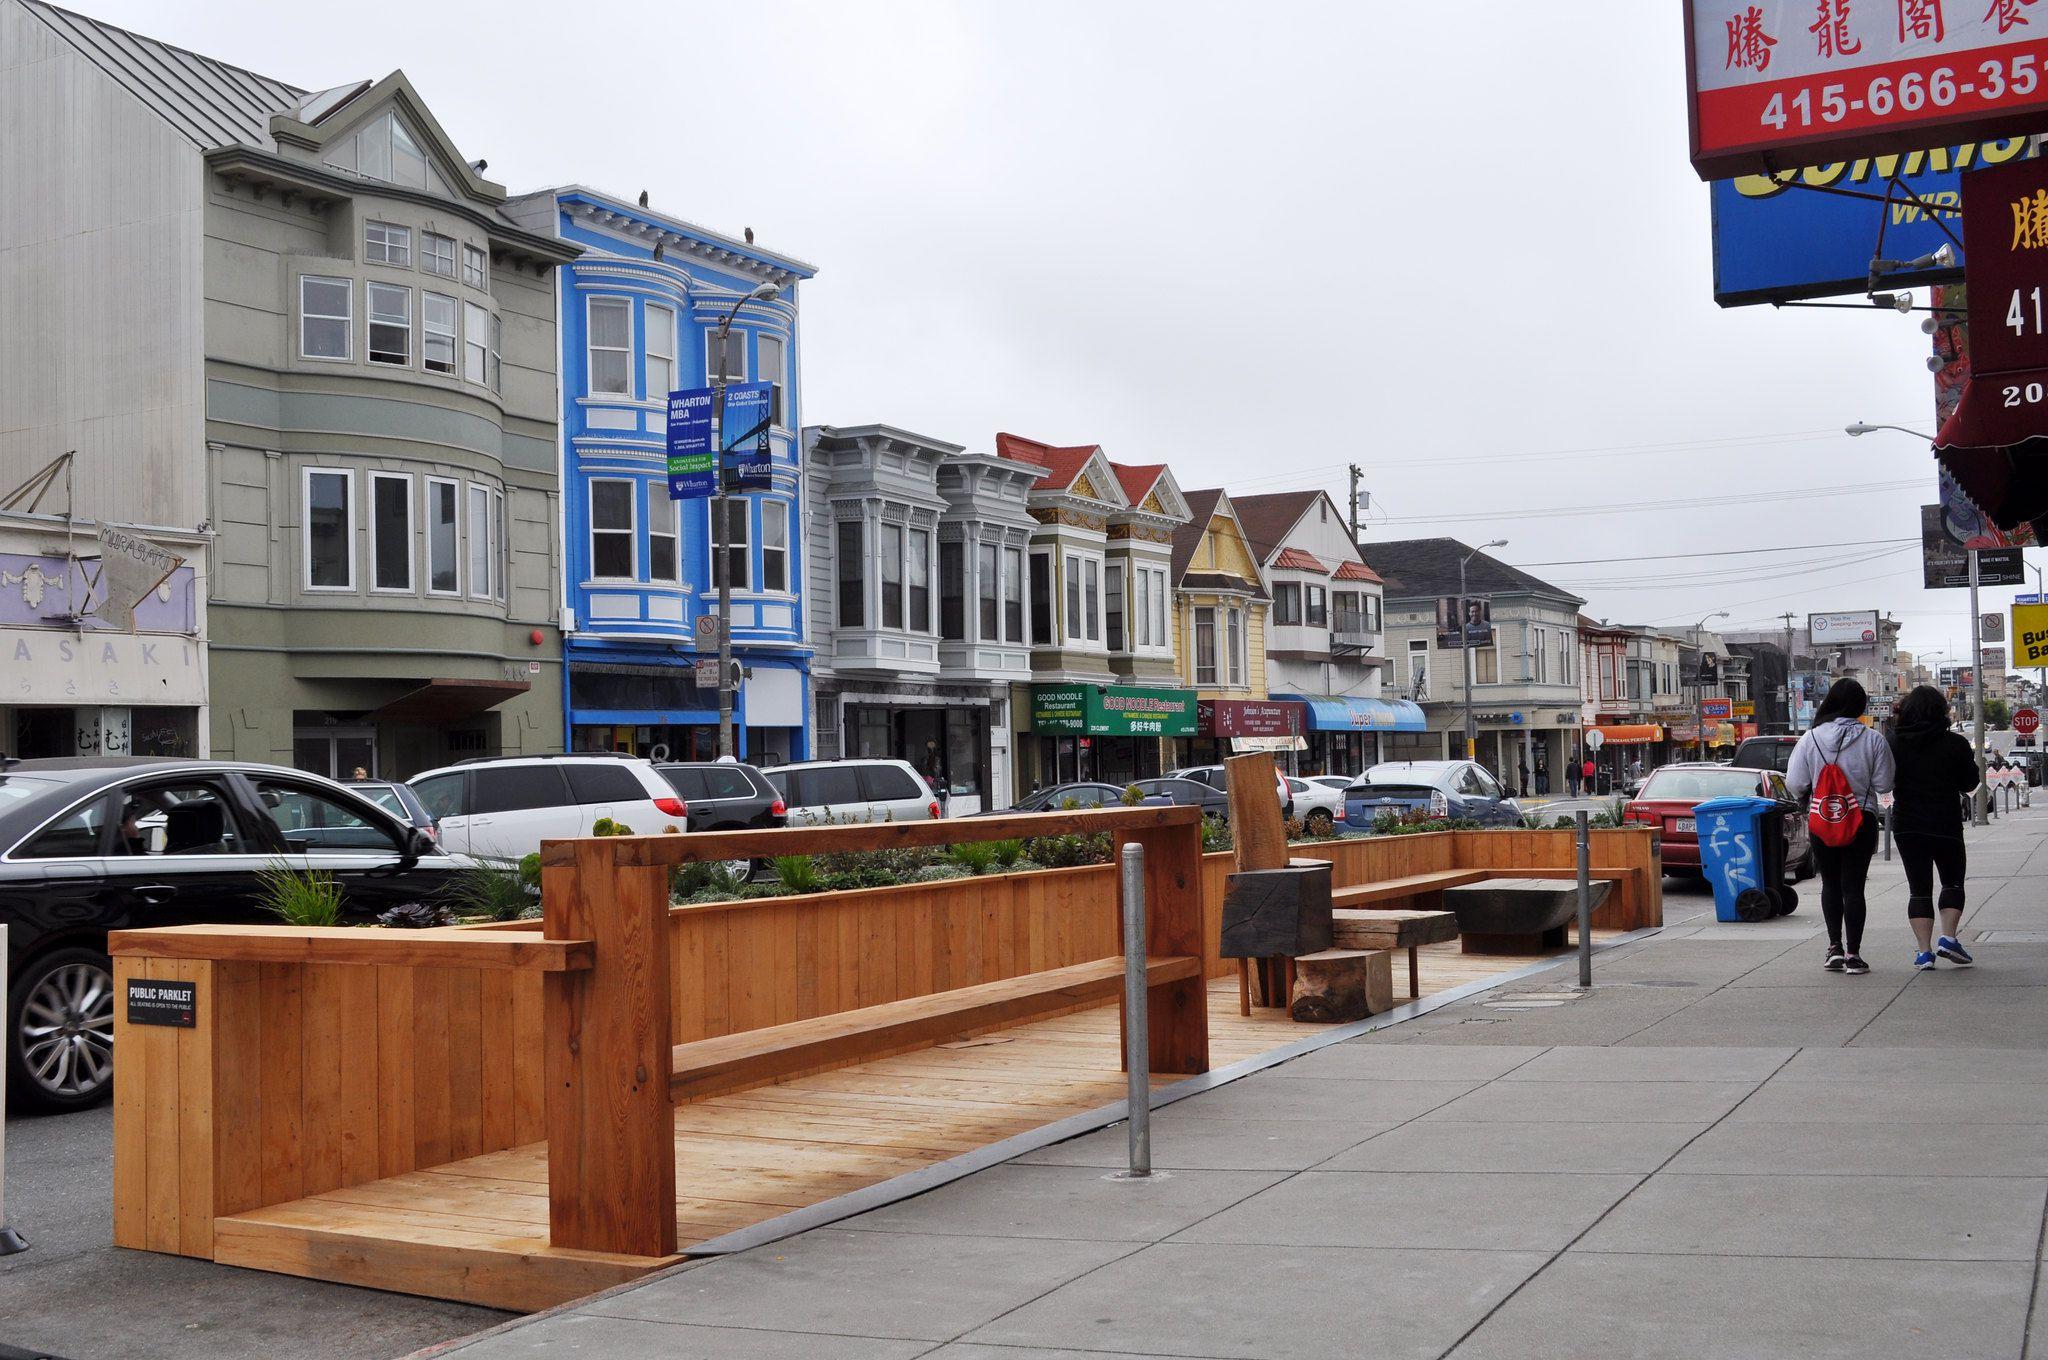 8 Things to Do in San Francisco's Richmond Neighborhood